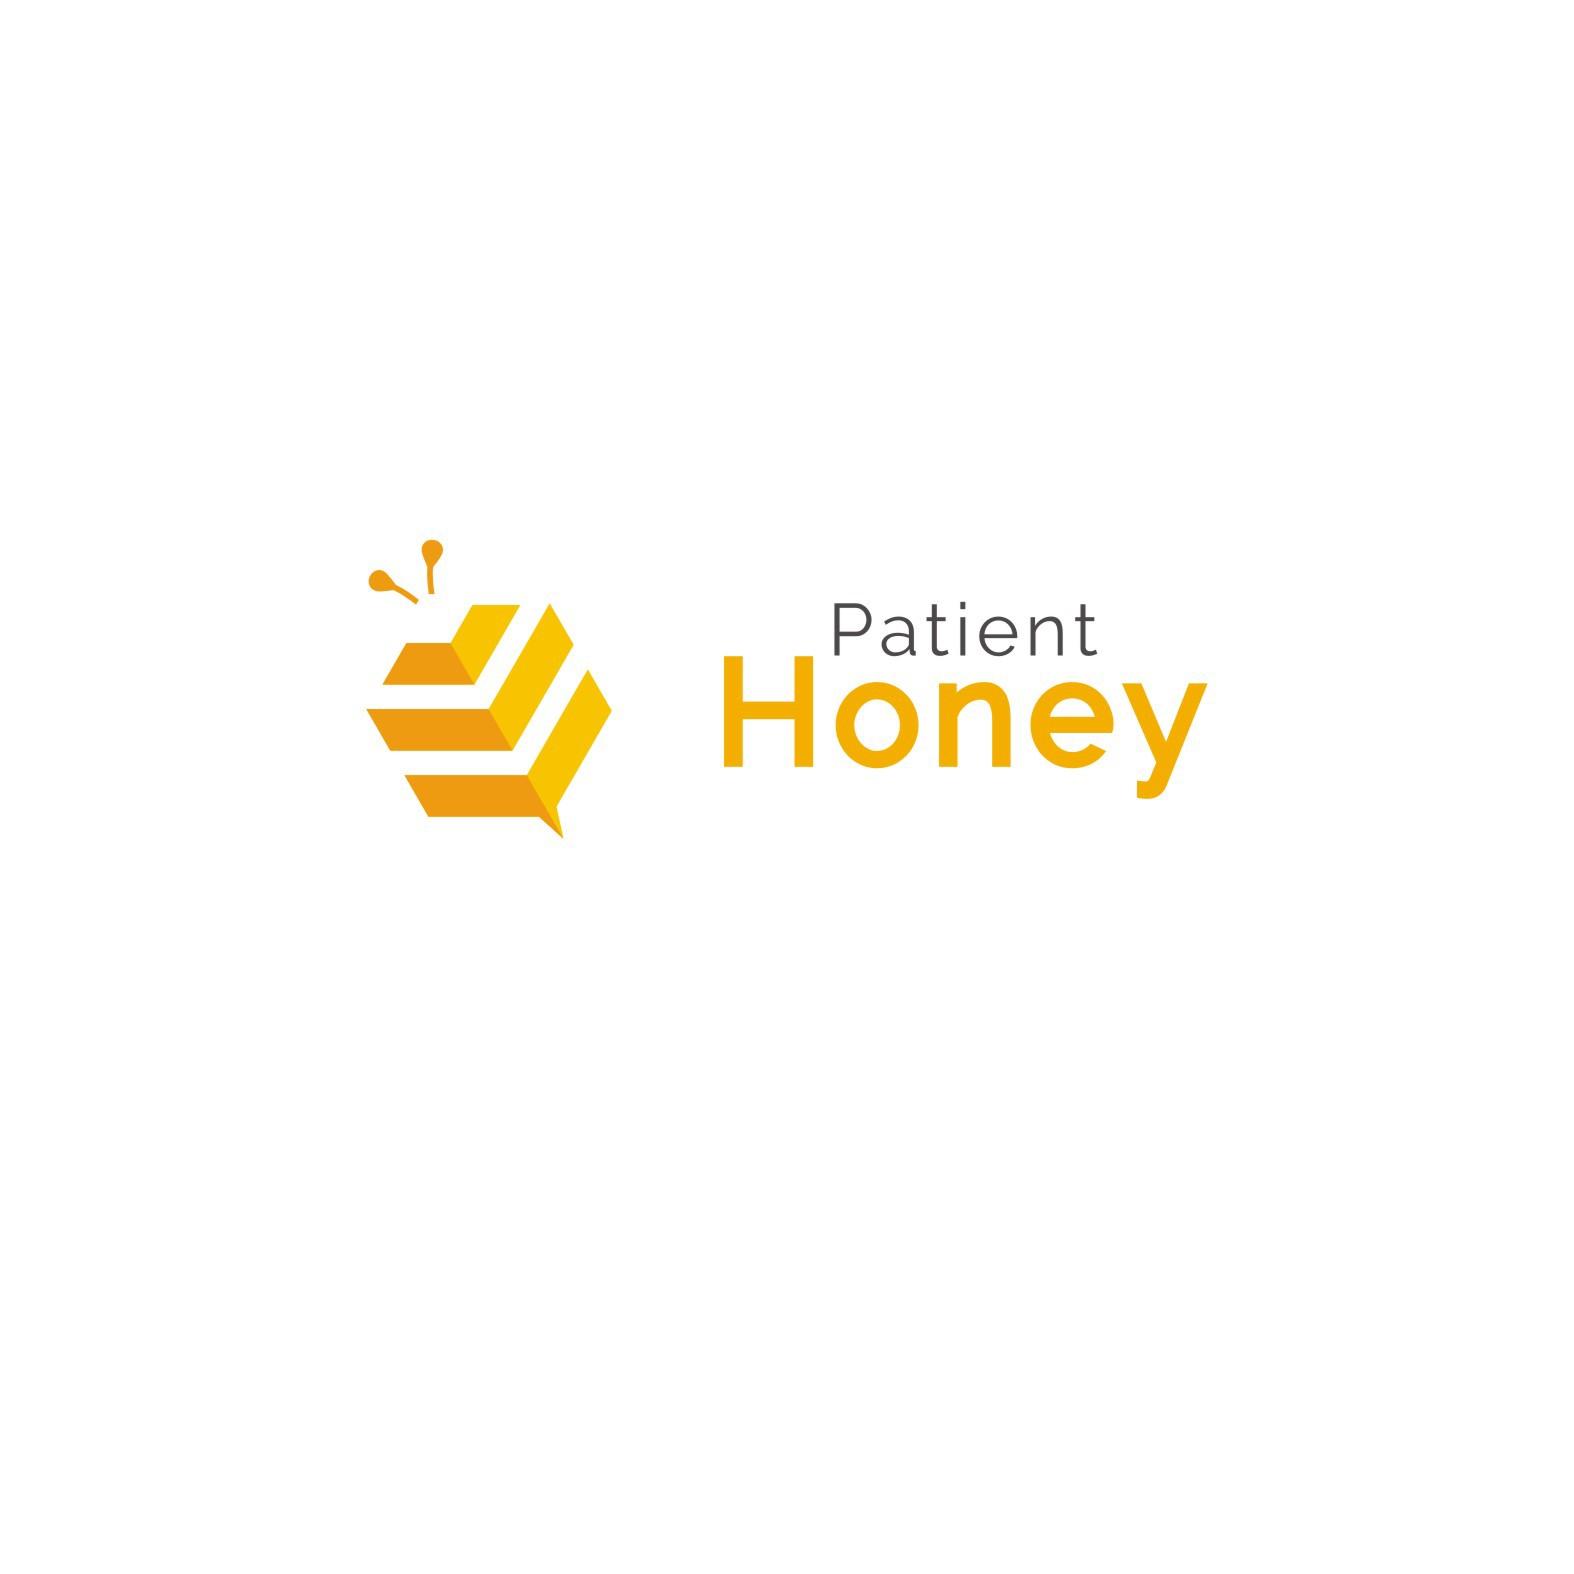 patient honey logo